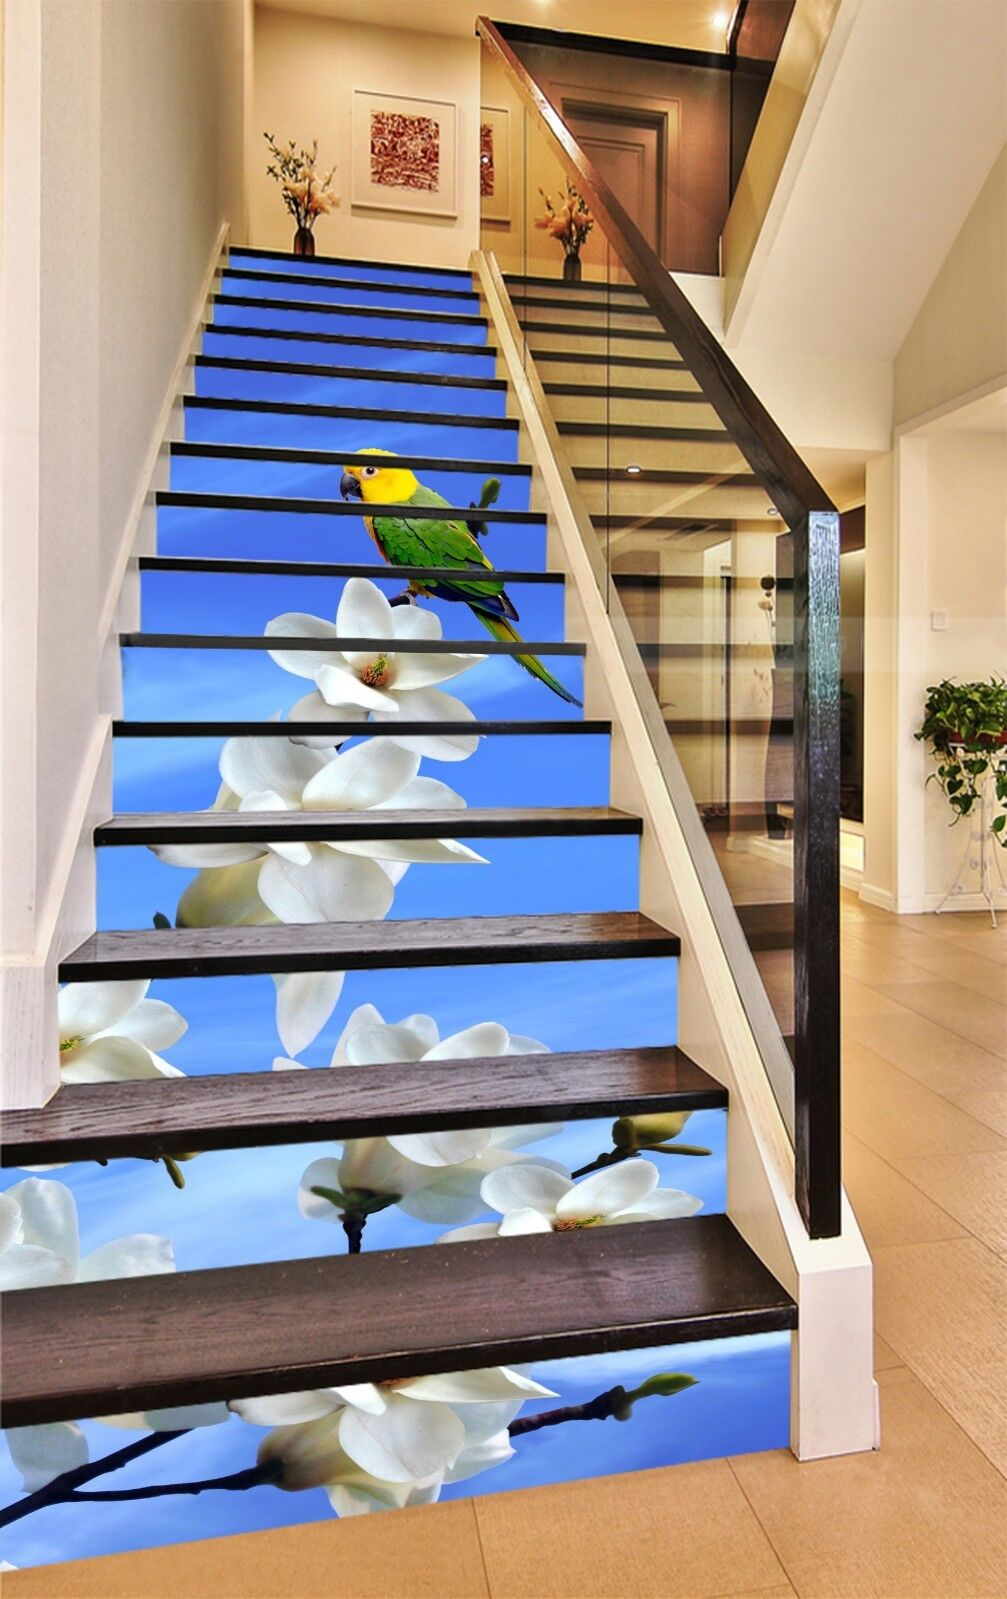 3D Squid Bird Stair Risers Decoration Photo Mural Vinyl Decal WandPapier US